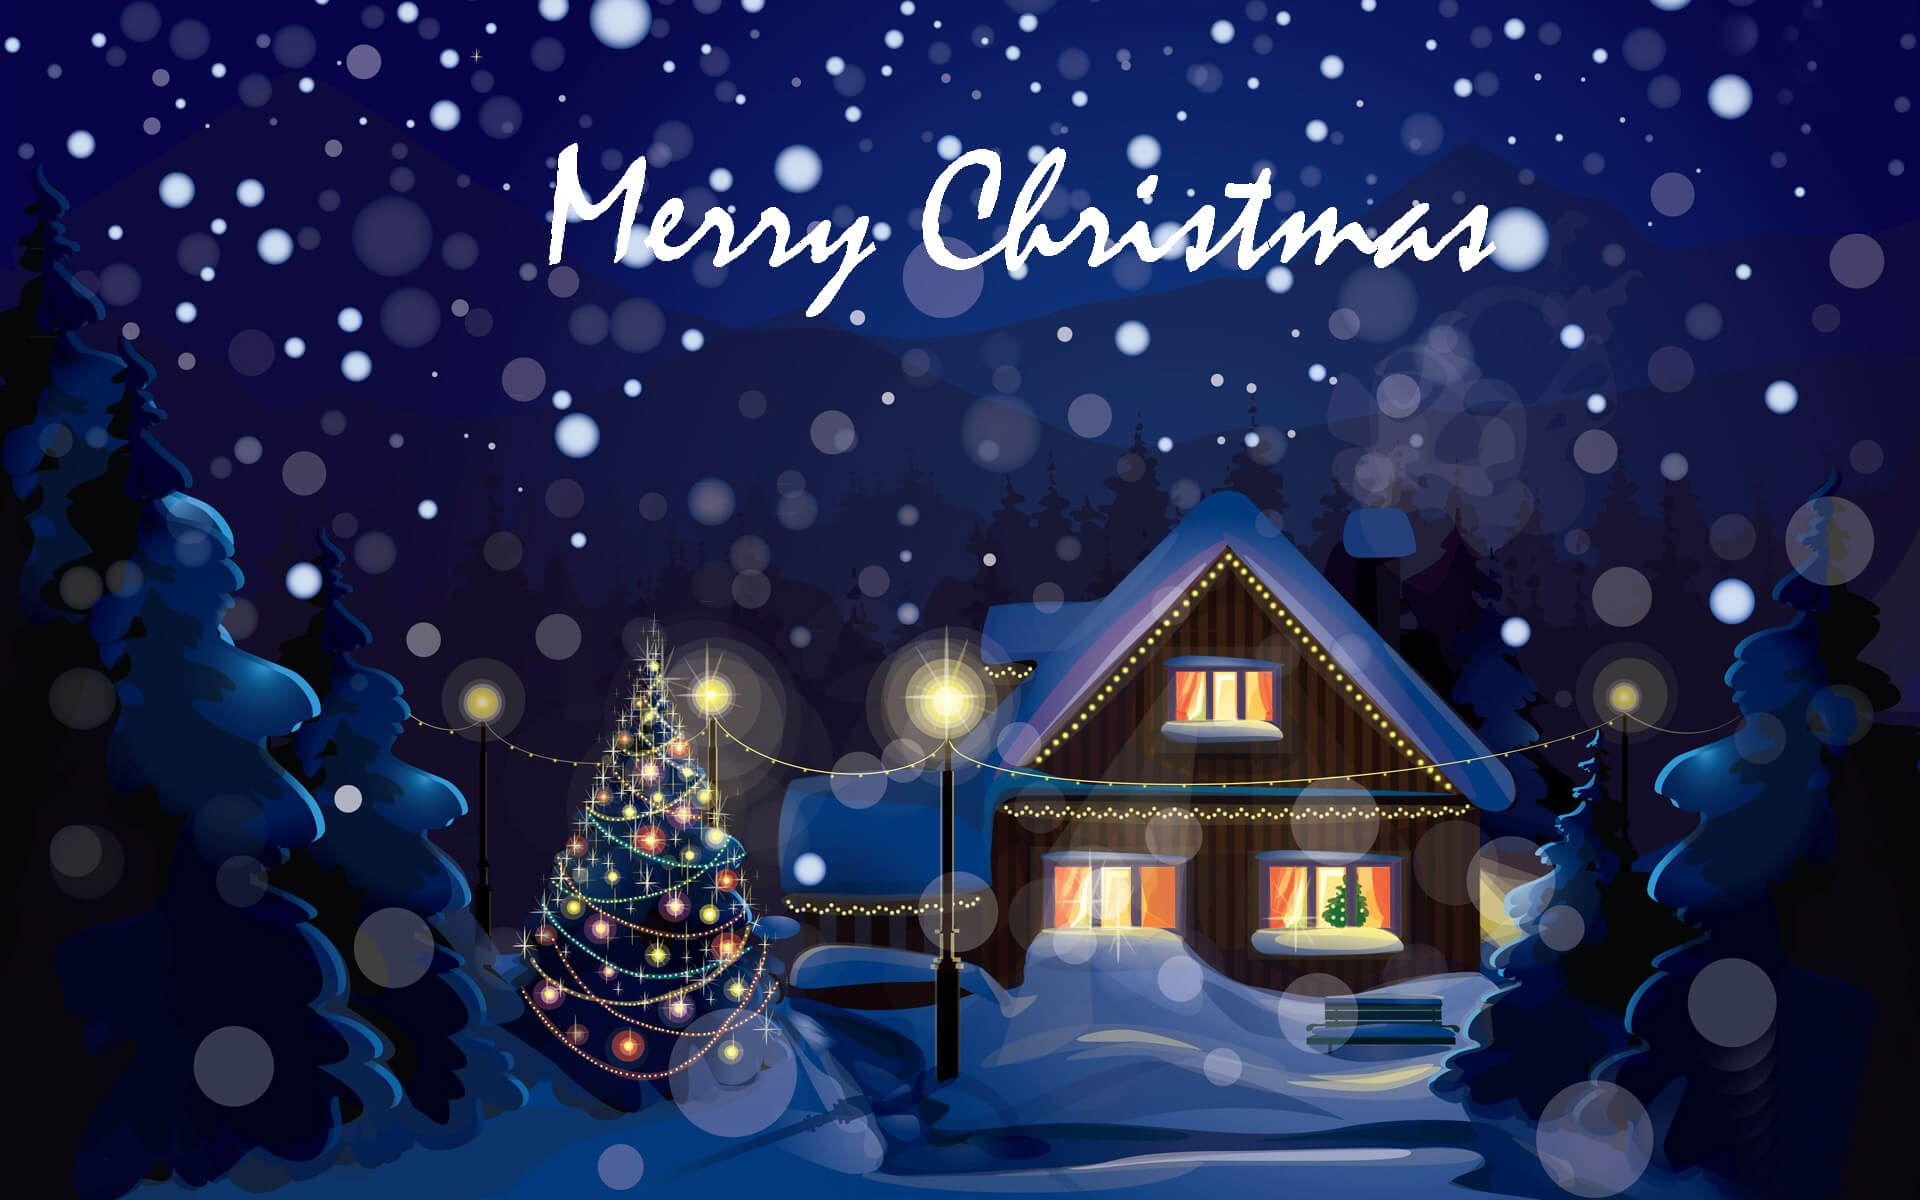 merry christmas live photo